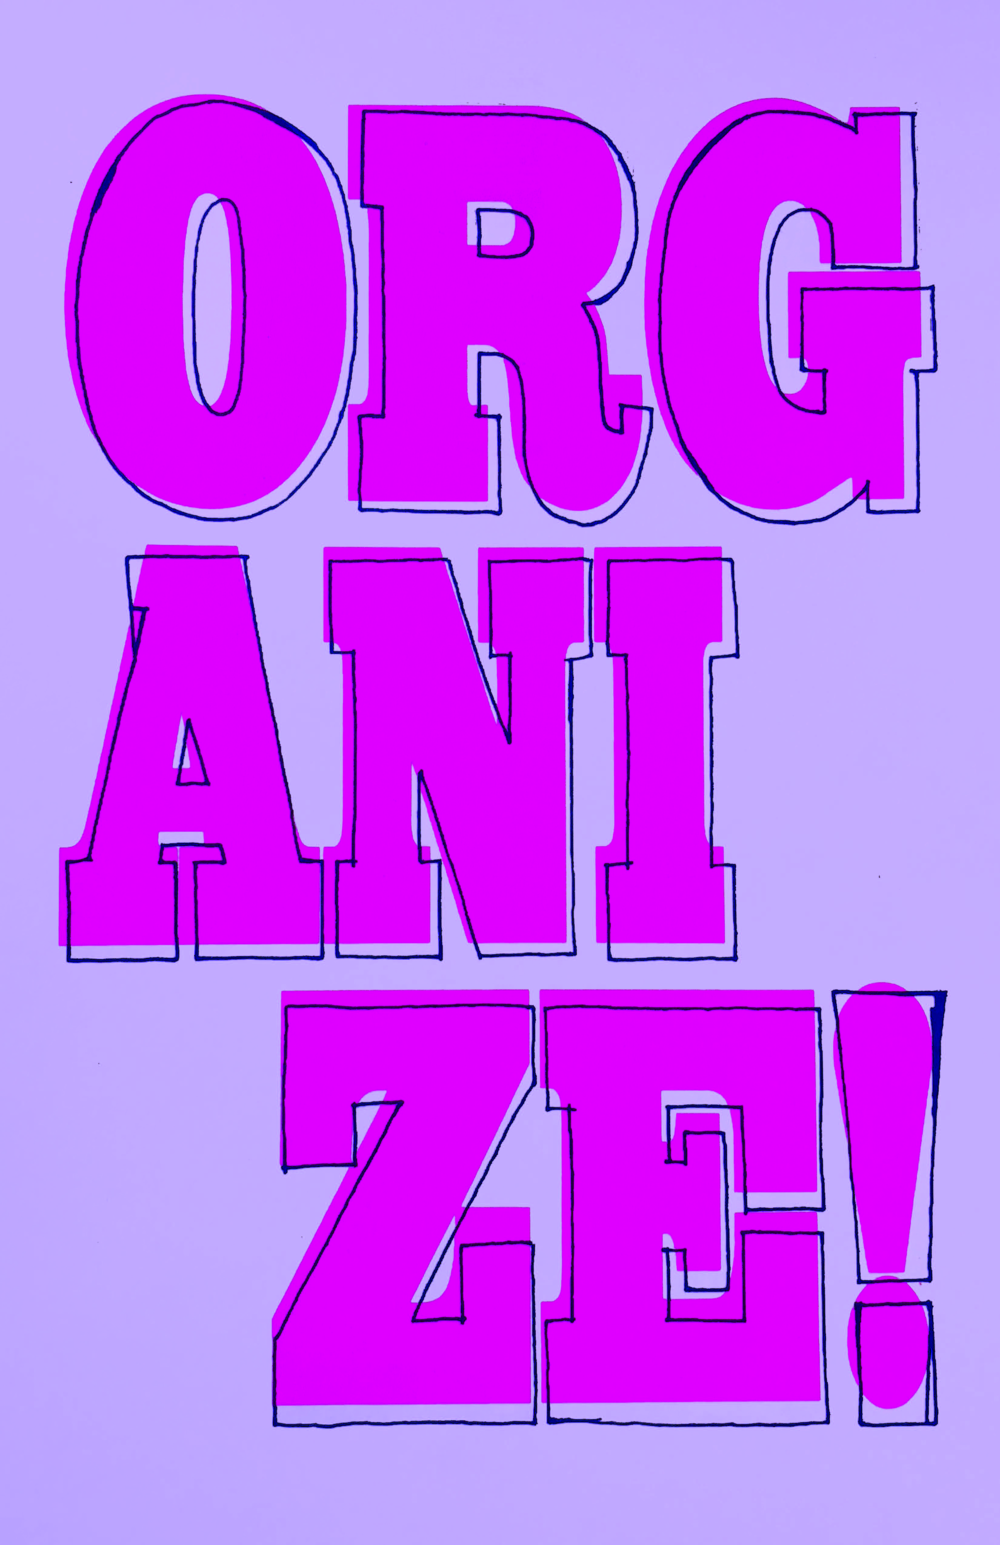 MacPhee_OrganizeGraphic 3.png